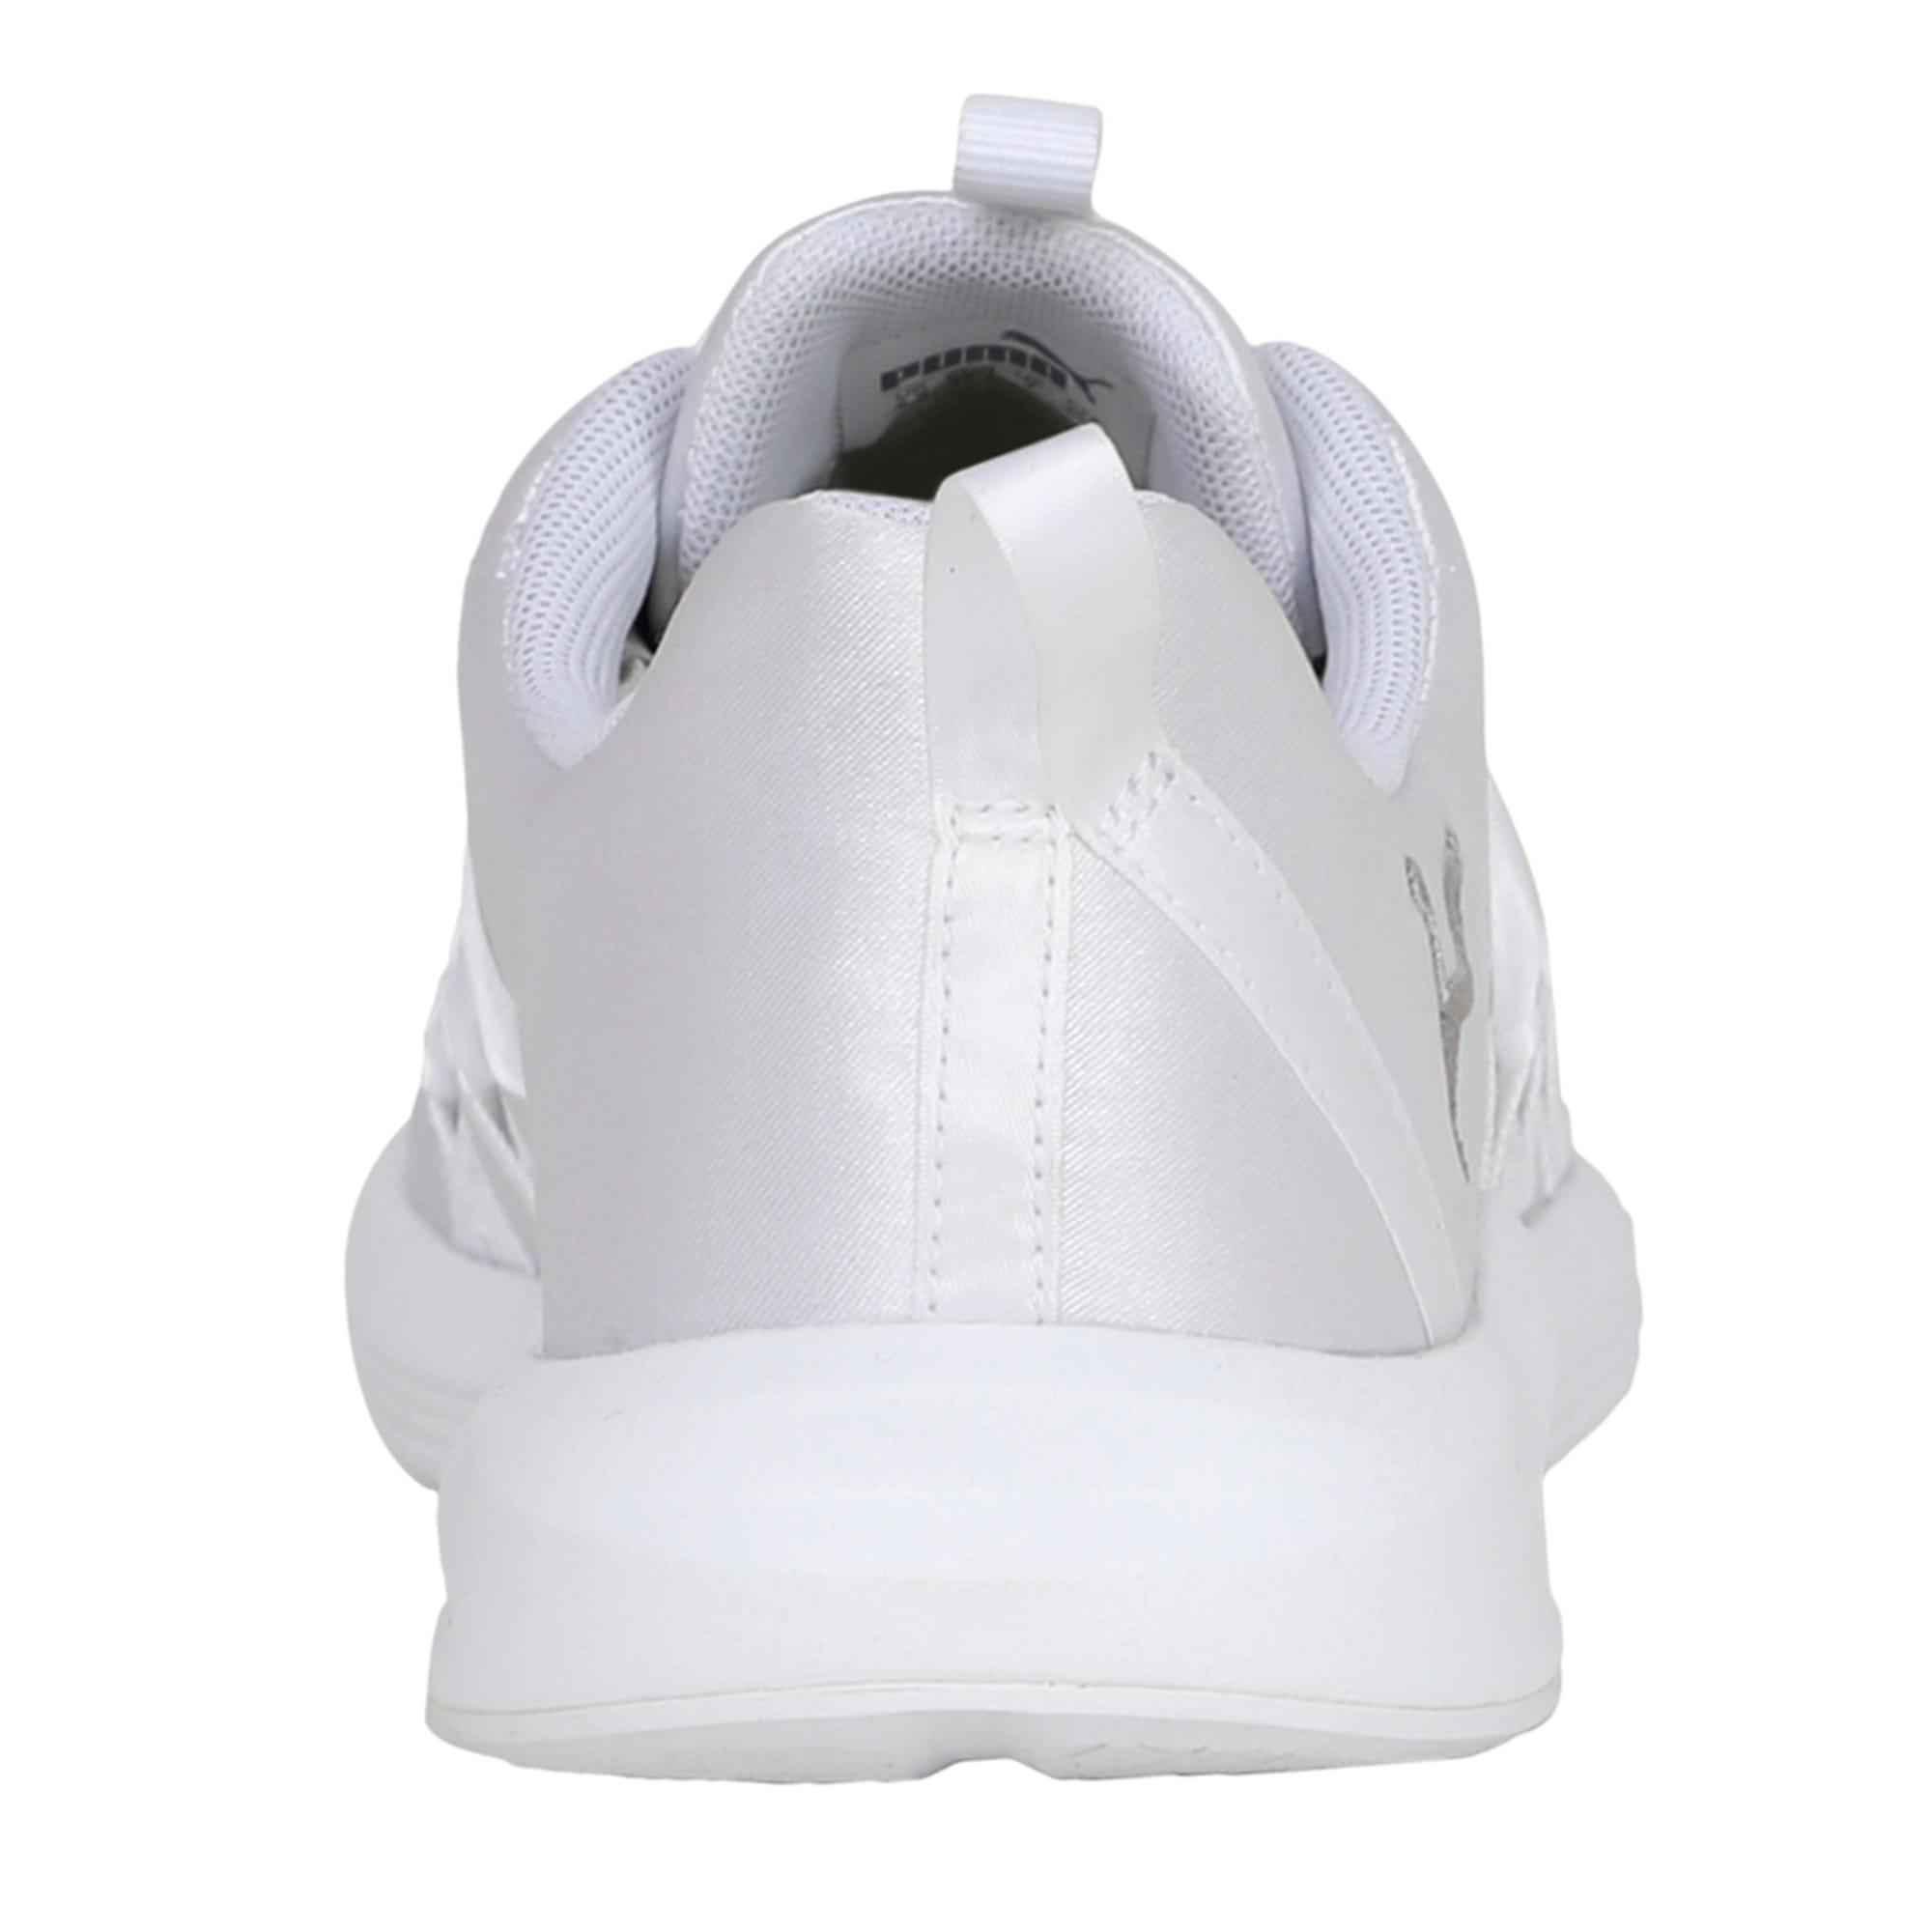 Thumbnail 4 of Prowl Alt Satin Women's Training Shoes, Puma White, medium-IND